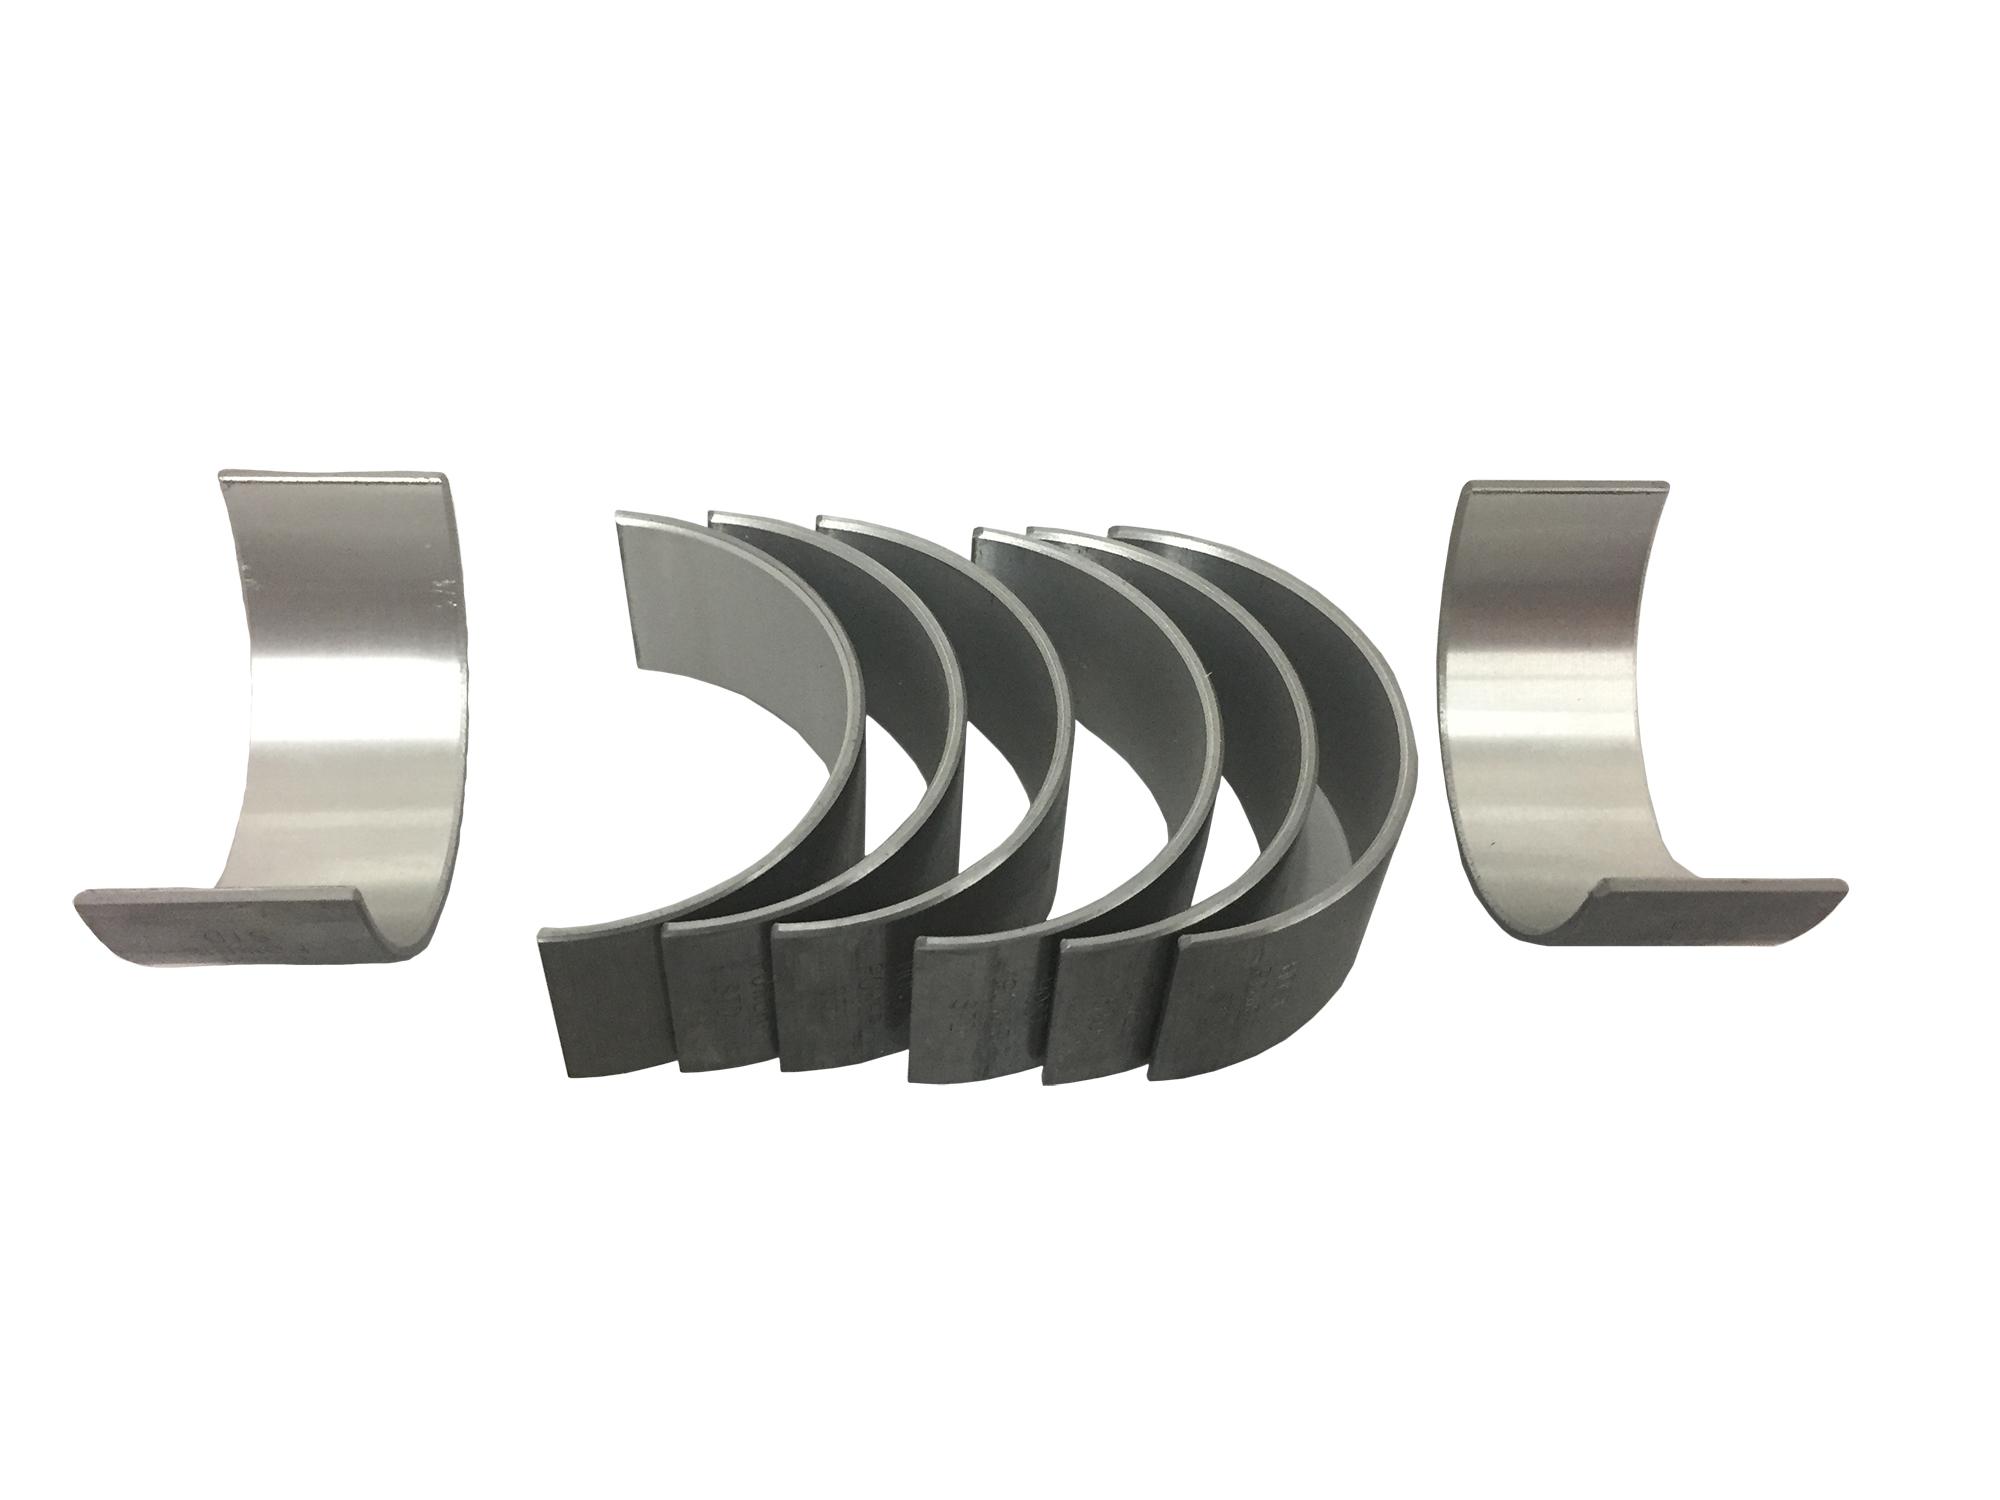 Pleuellagerschale Pleuellager STD Mini Cooper R56 1,6 N16B16A 11247586035 NEU